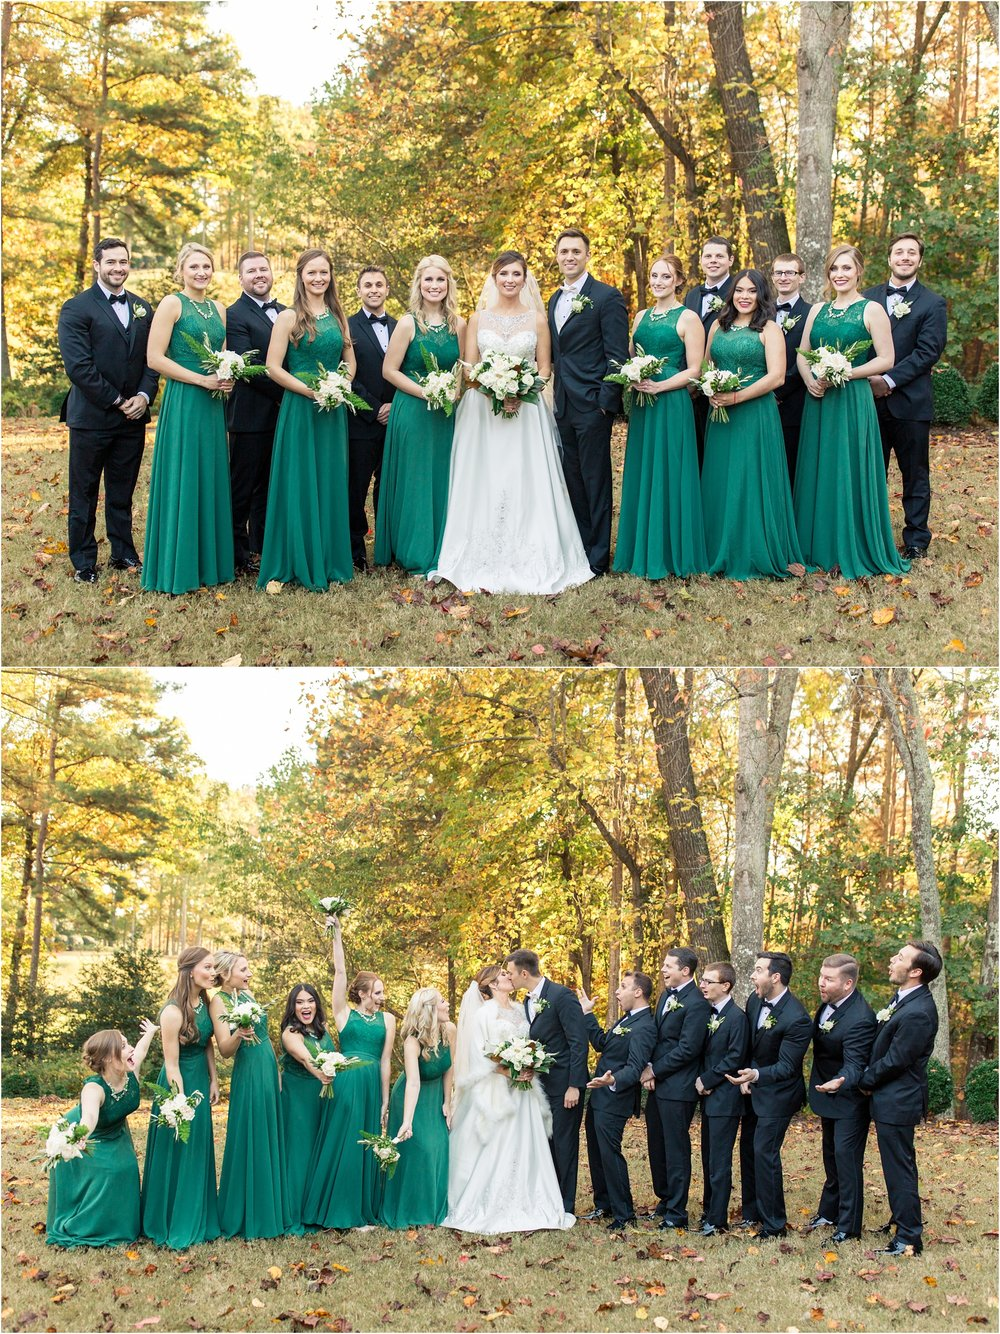 Savannah Eve Photography- Bottiglion-Scope Wedding- Sneak Peek-36.jpg